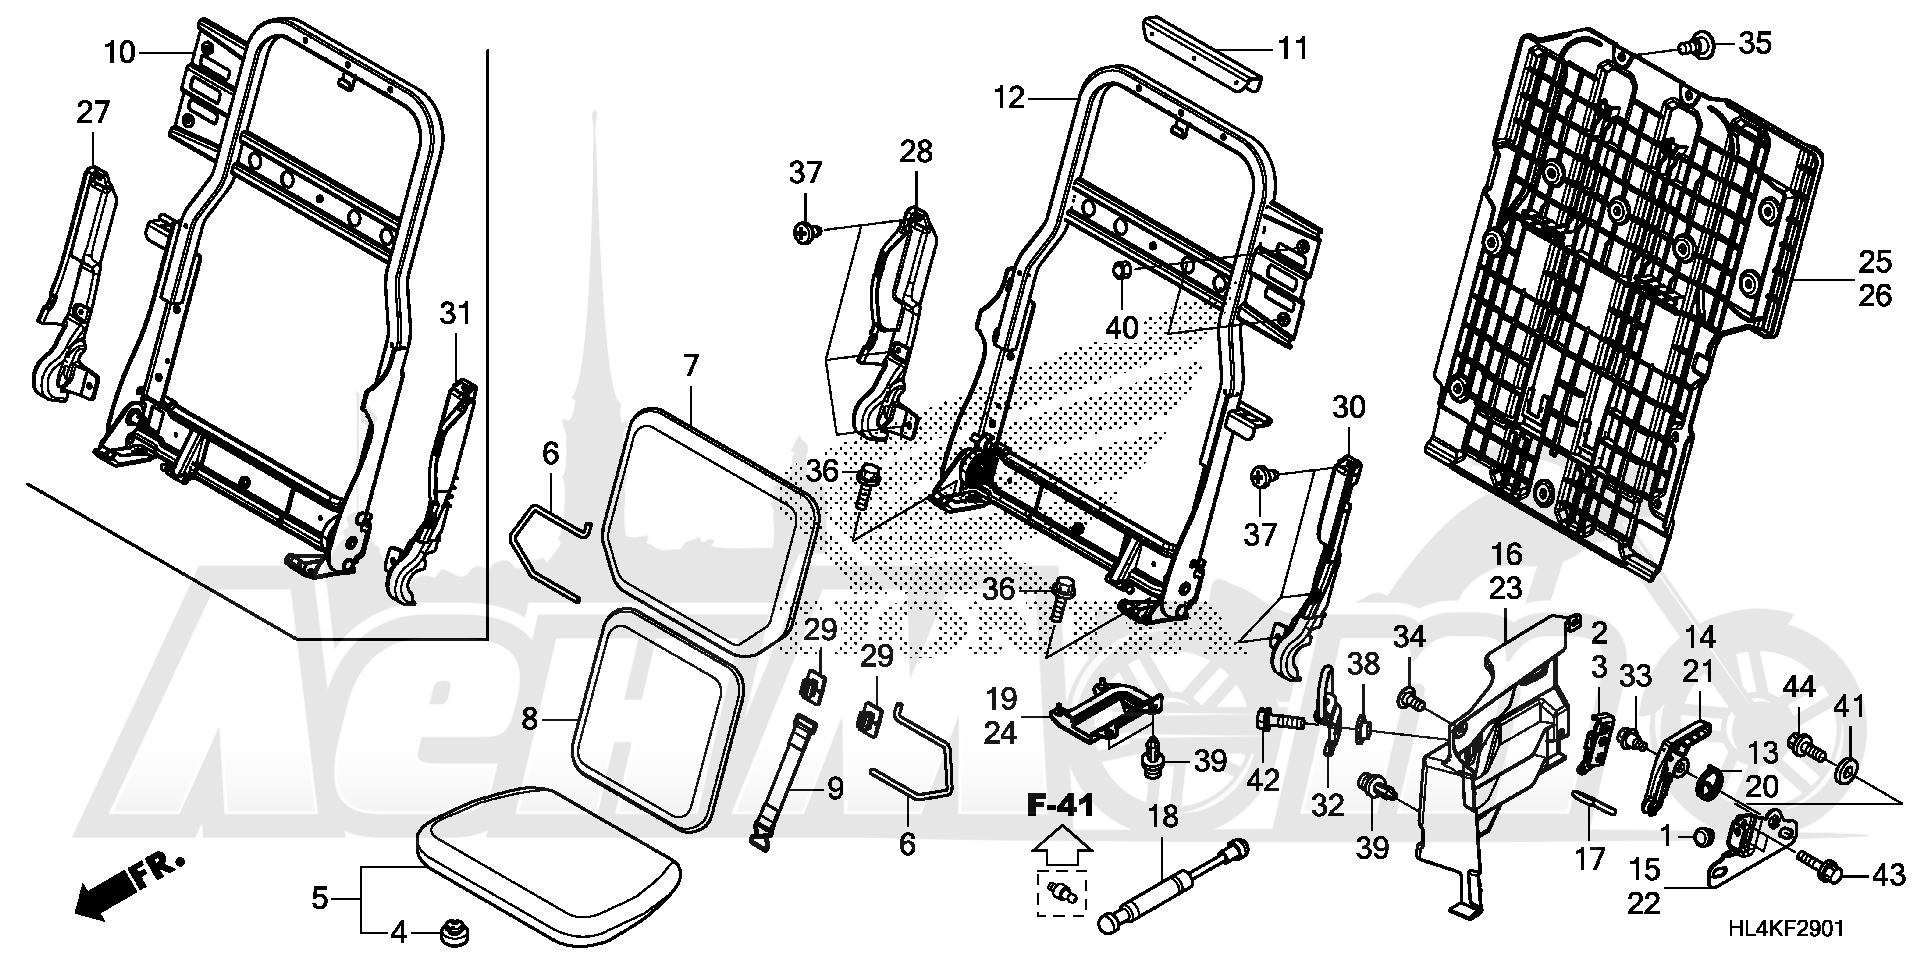 Запчасти для Квадроцикла Honda 2019 SXS1000M5D Раздел: REAR SEAT | зад сиденье